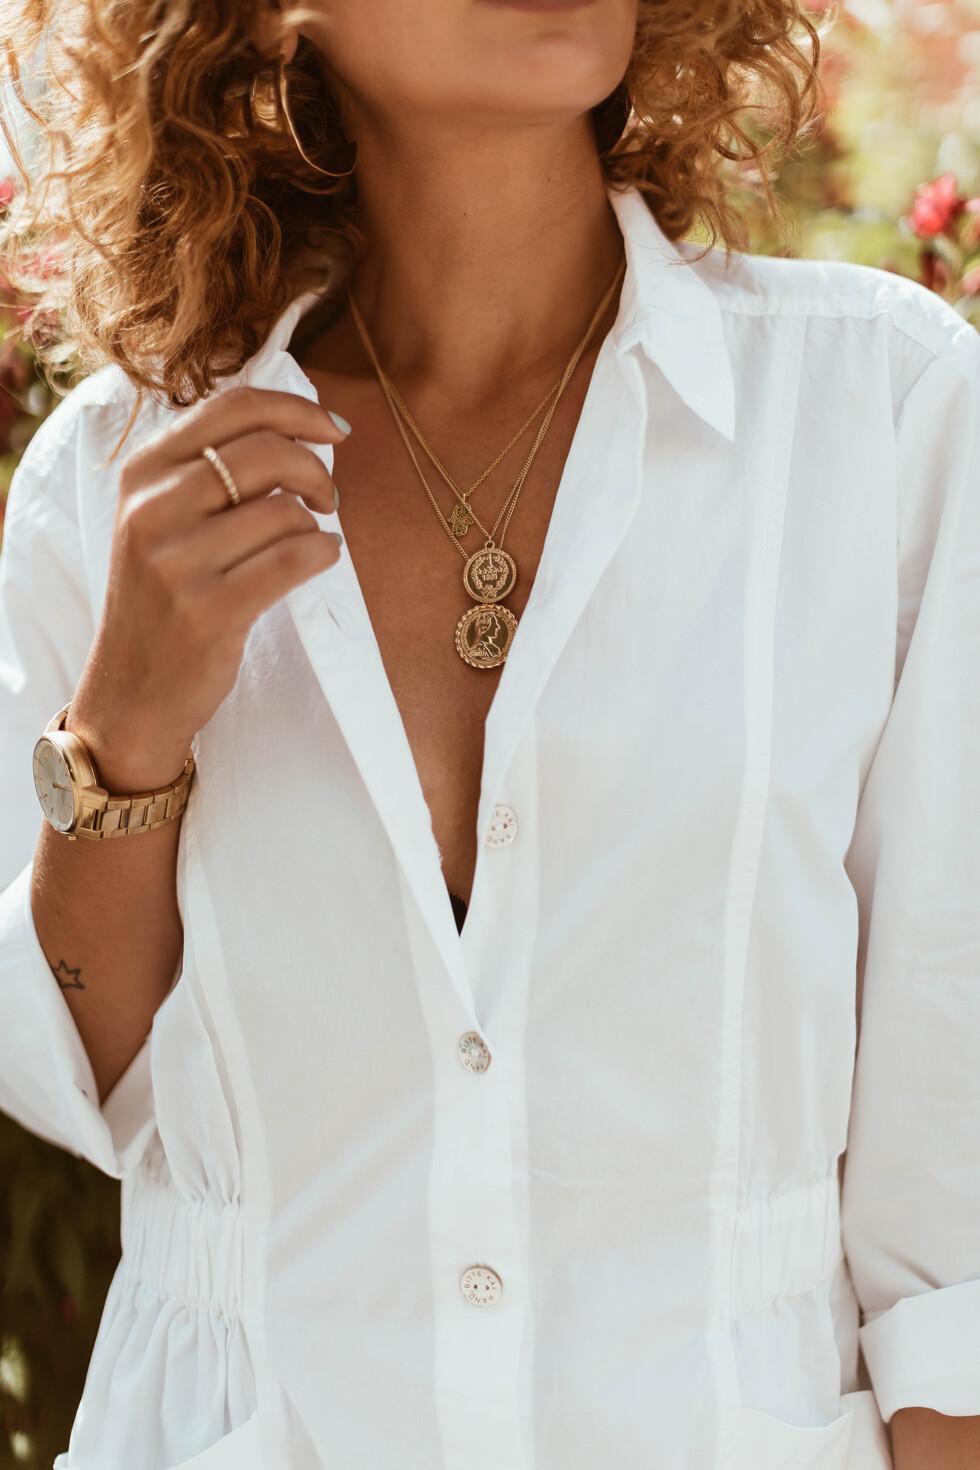 sara-che-coin-necklace-zalando-bitte-kai-rand-jumpsuit-hamsa-systerp